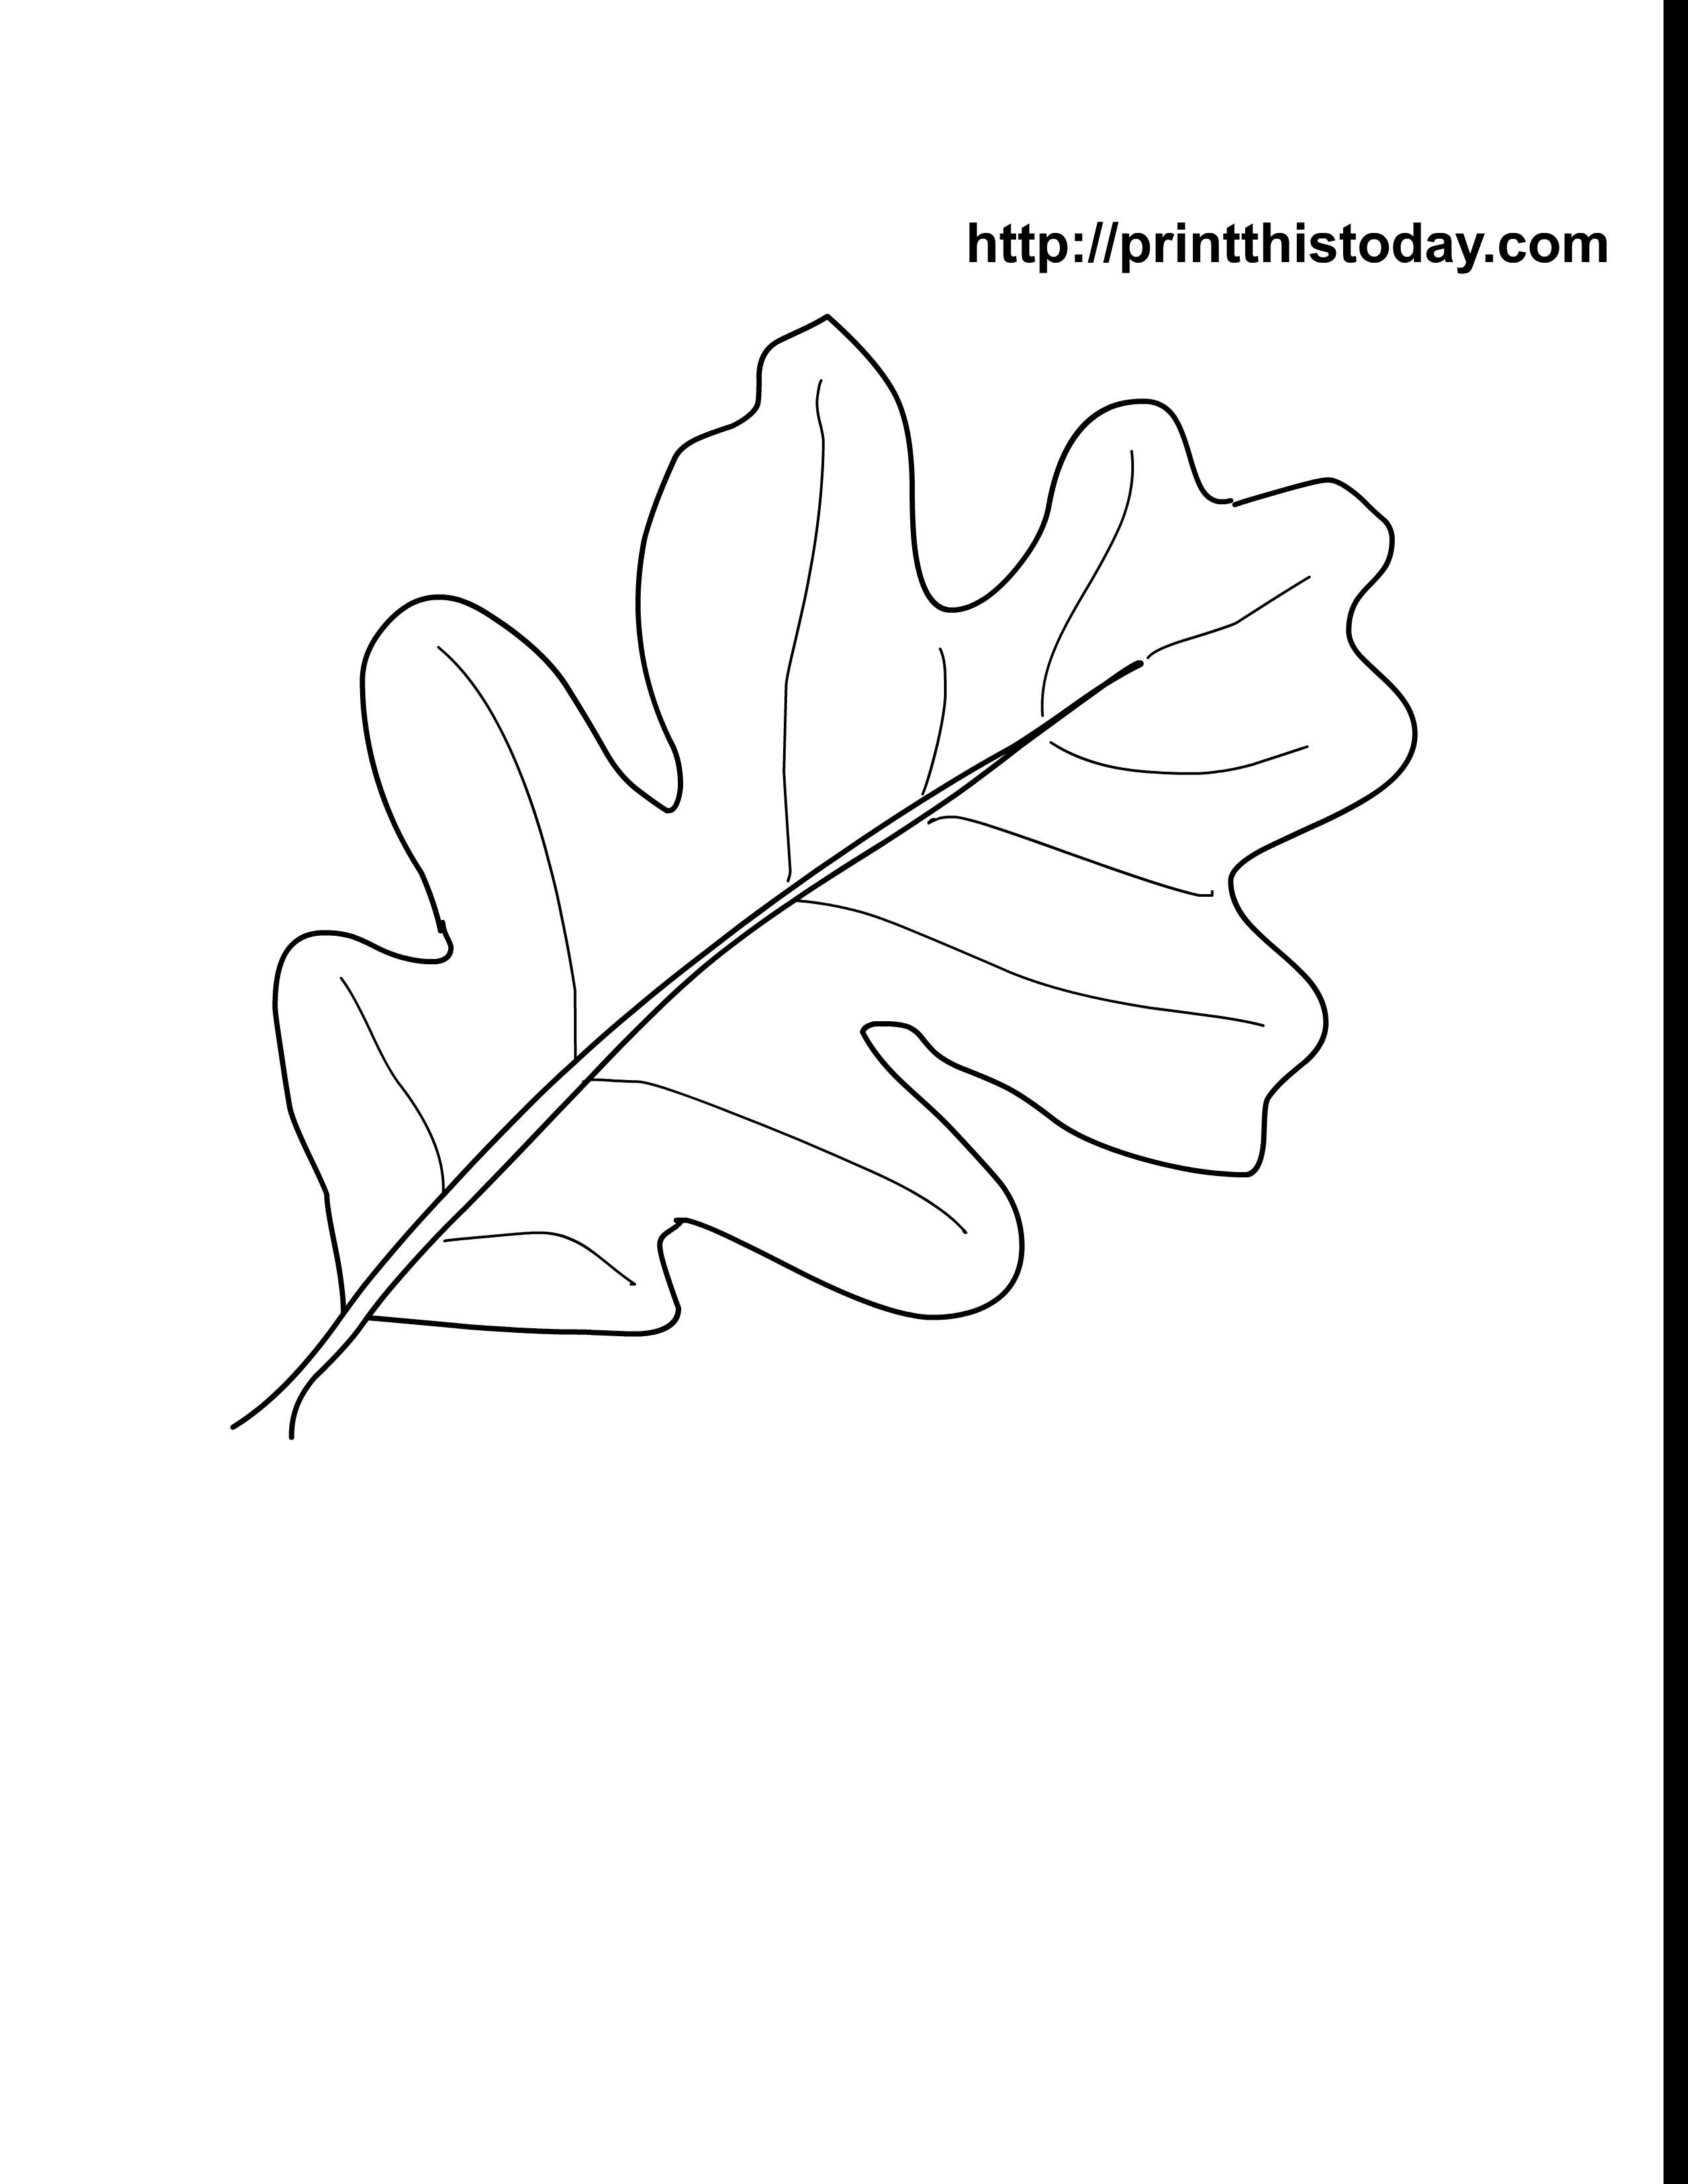 Oak Leaf Coloring Page Oak Leaf Coloring Page Line Art Hd Download Leaf Coloring Page Coloring Pages Printable Coloring Book